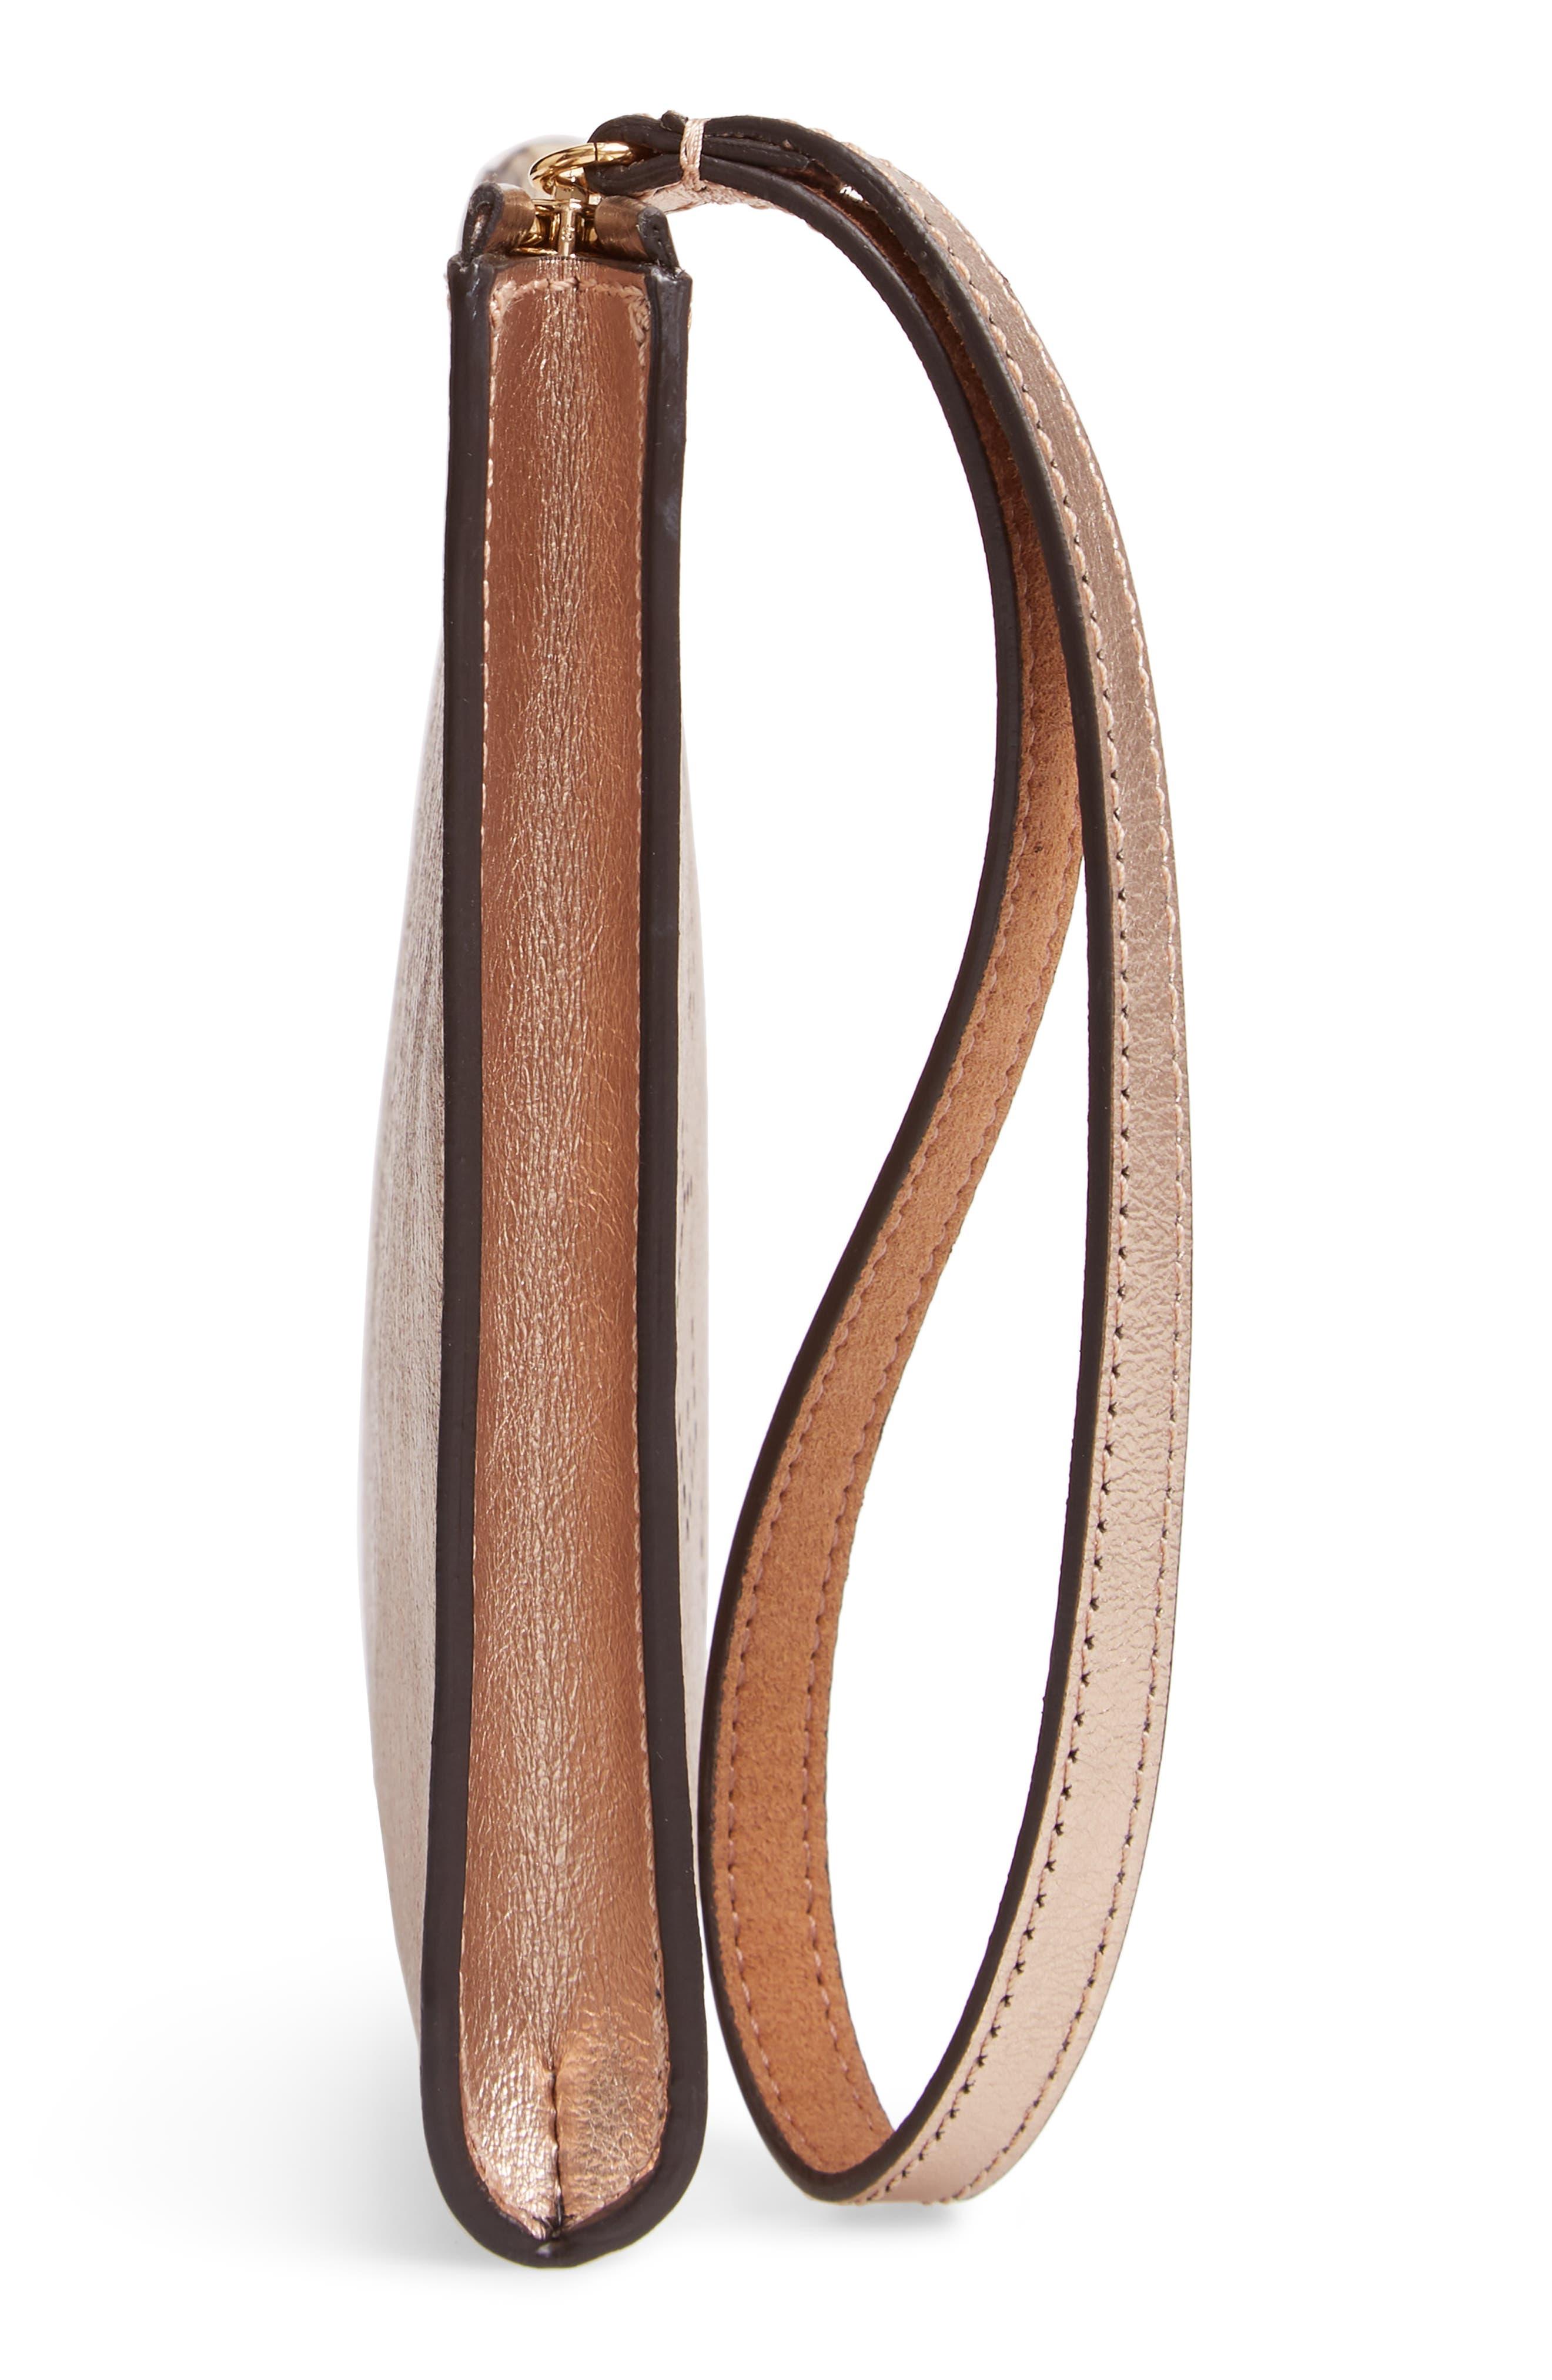 STELLA MCCARTNEY, Metallic Faux Nappa Leather Wristlet Clutch, Alternate thumbnail 5, color, 715